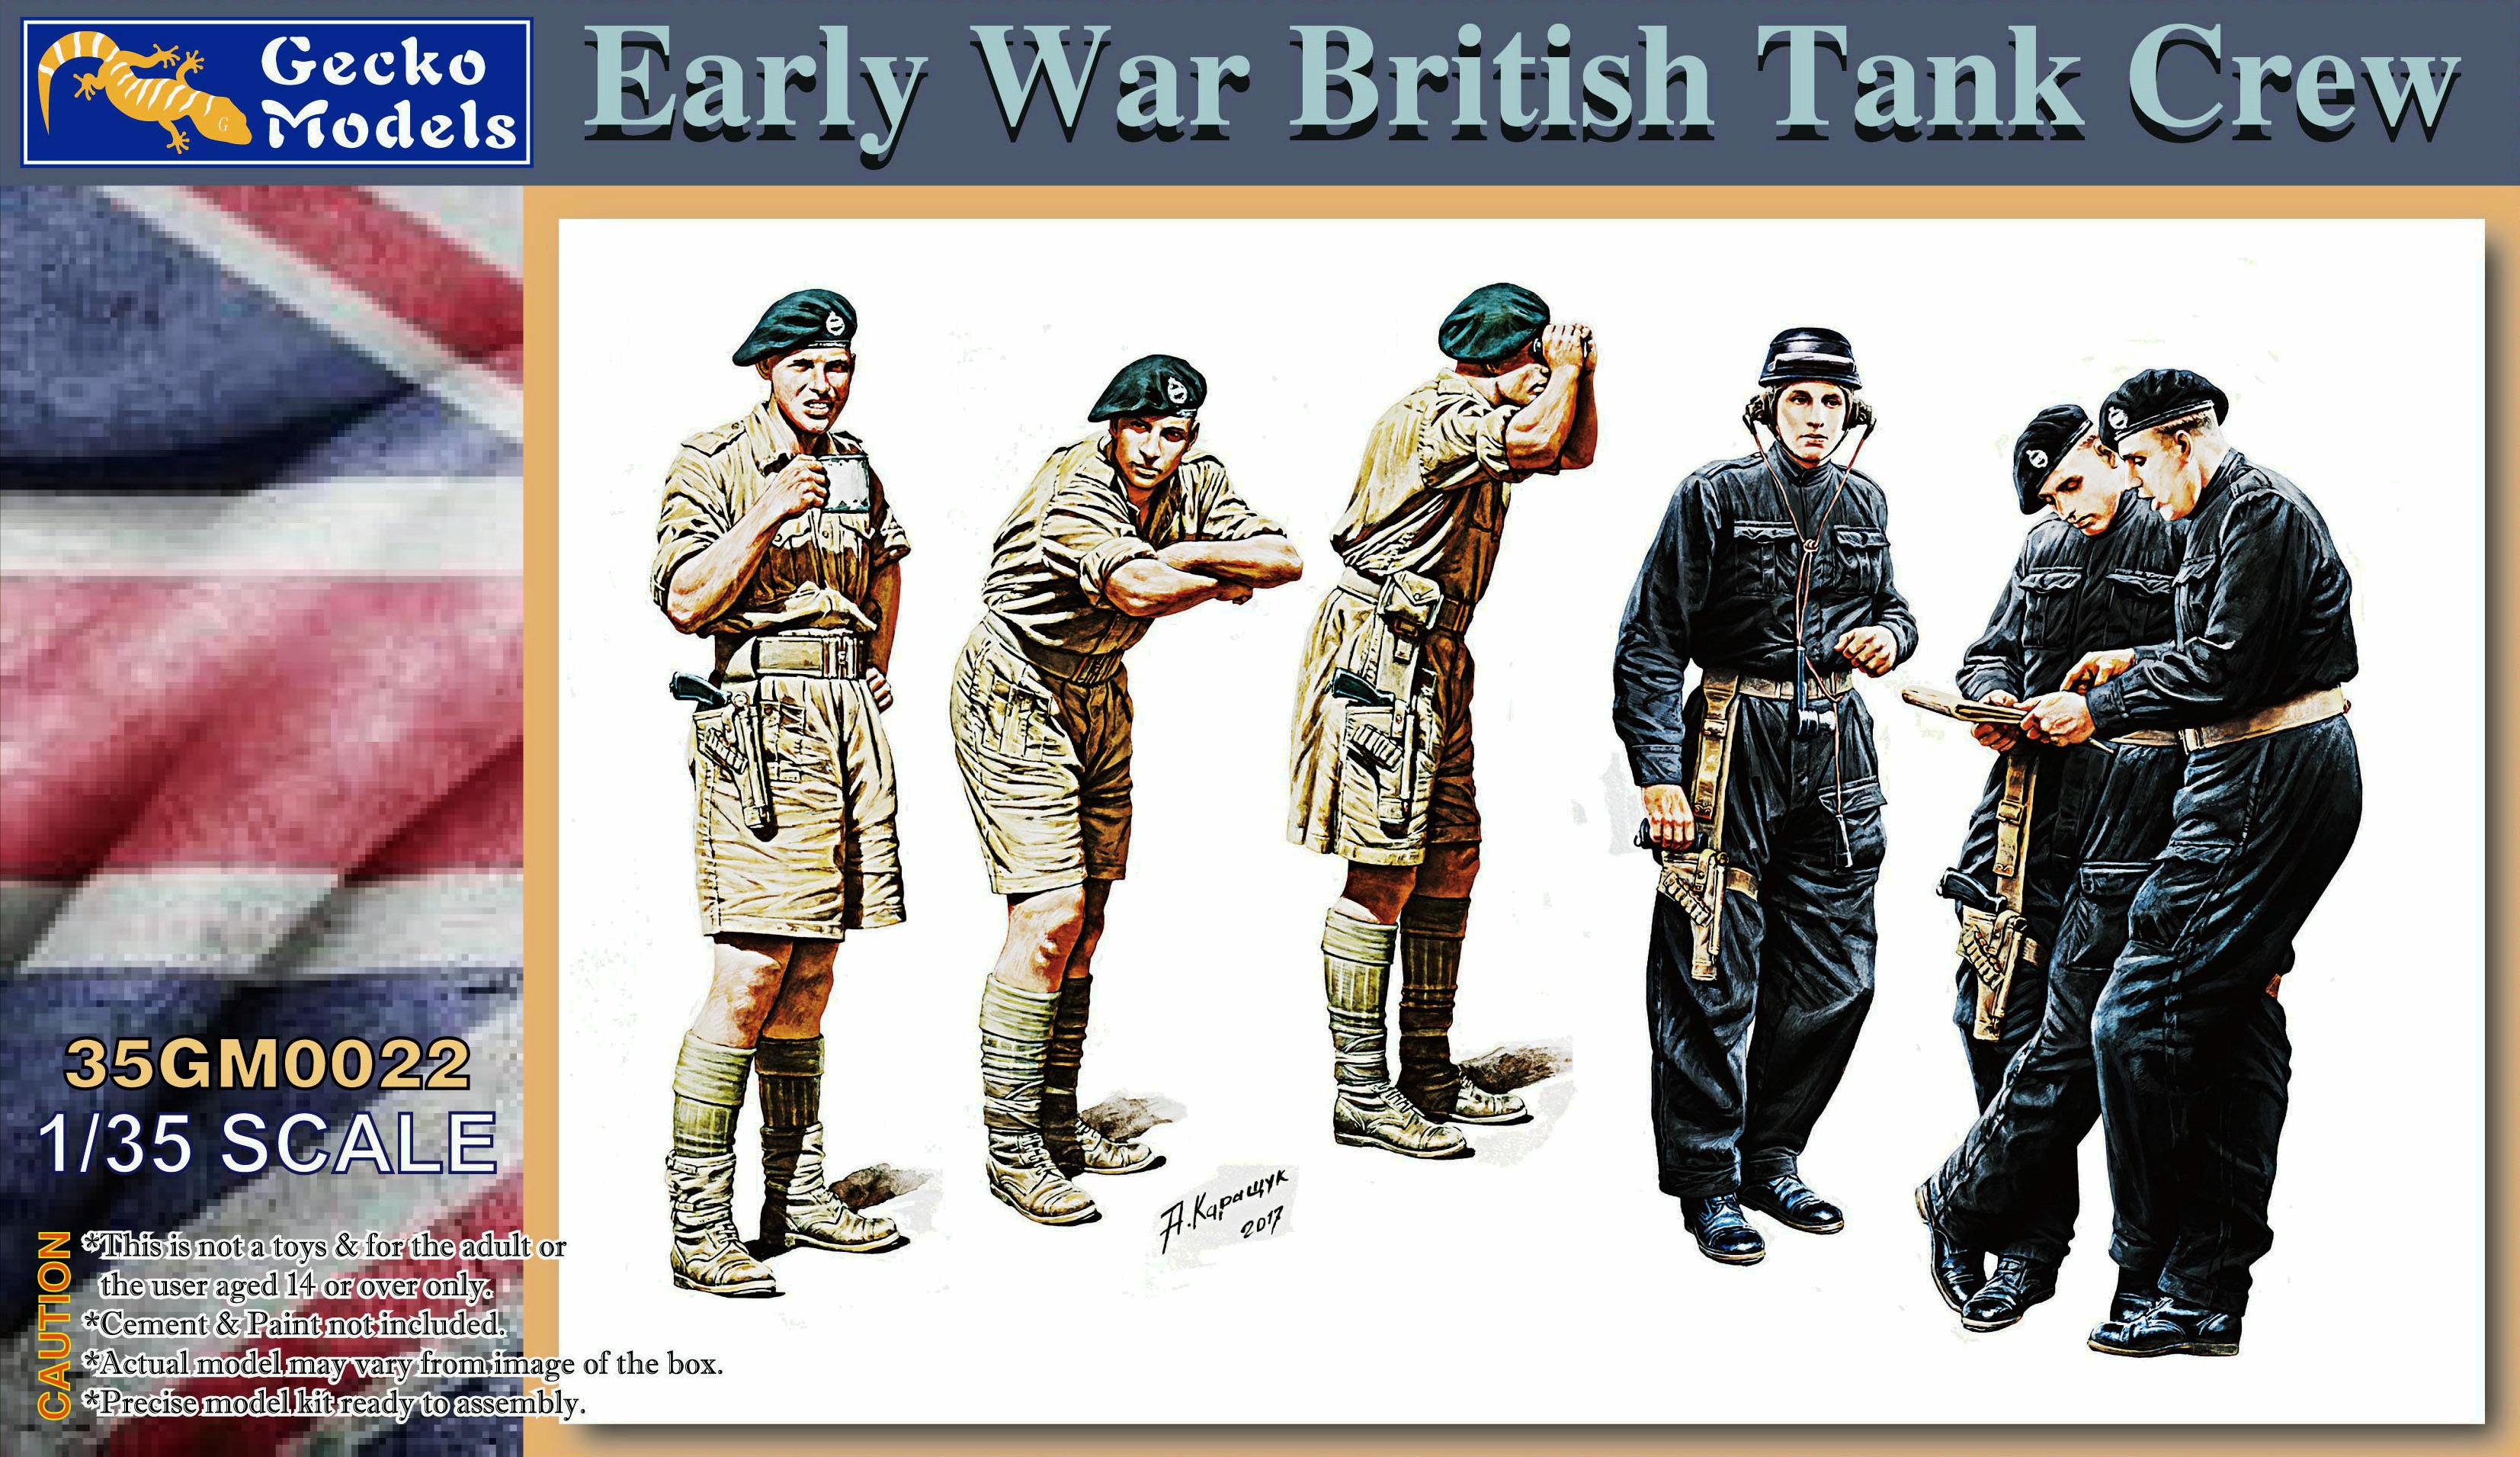 Gecko 1/35 Early War British Tank Crew